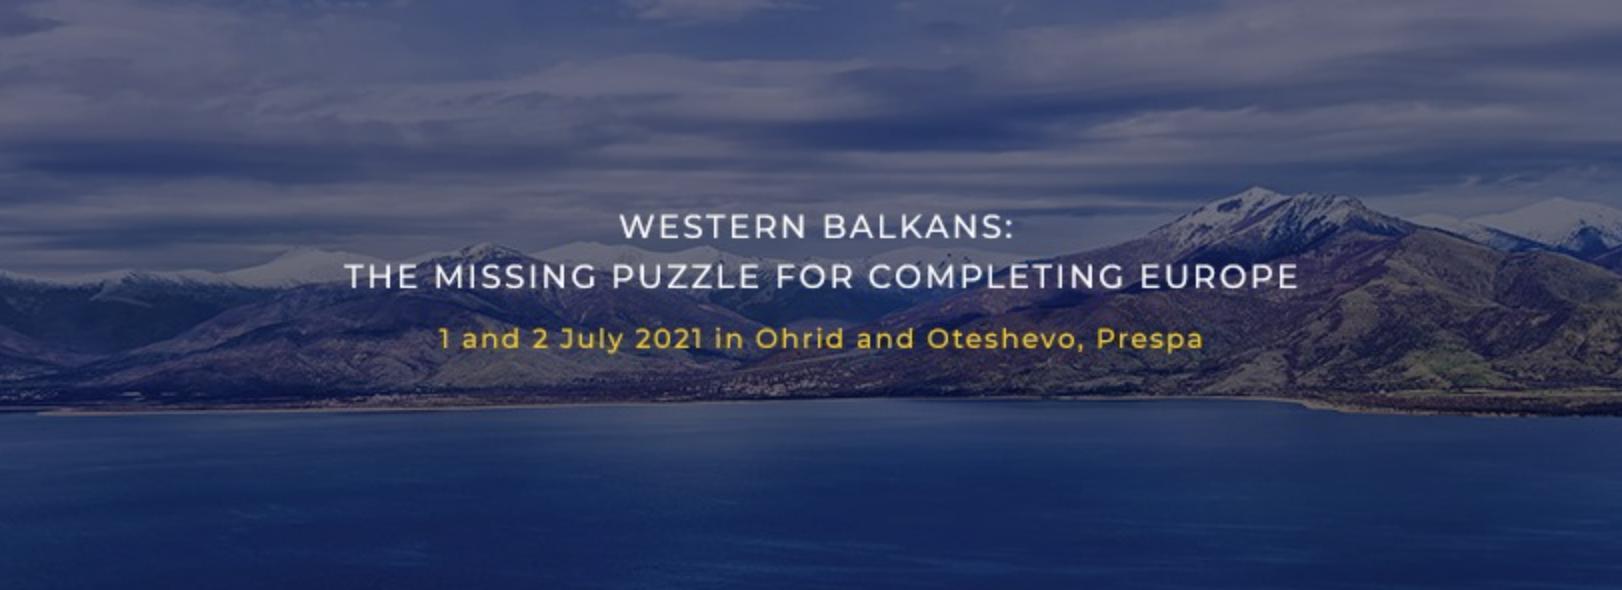 North Macedonia: July 1 and 2 the Prespa Forum